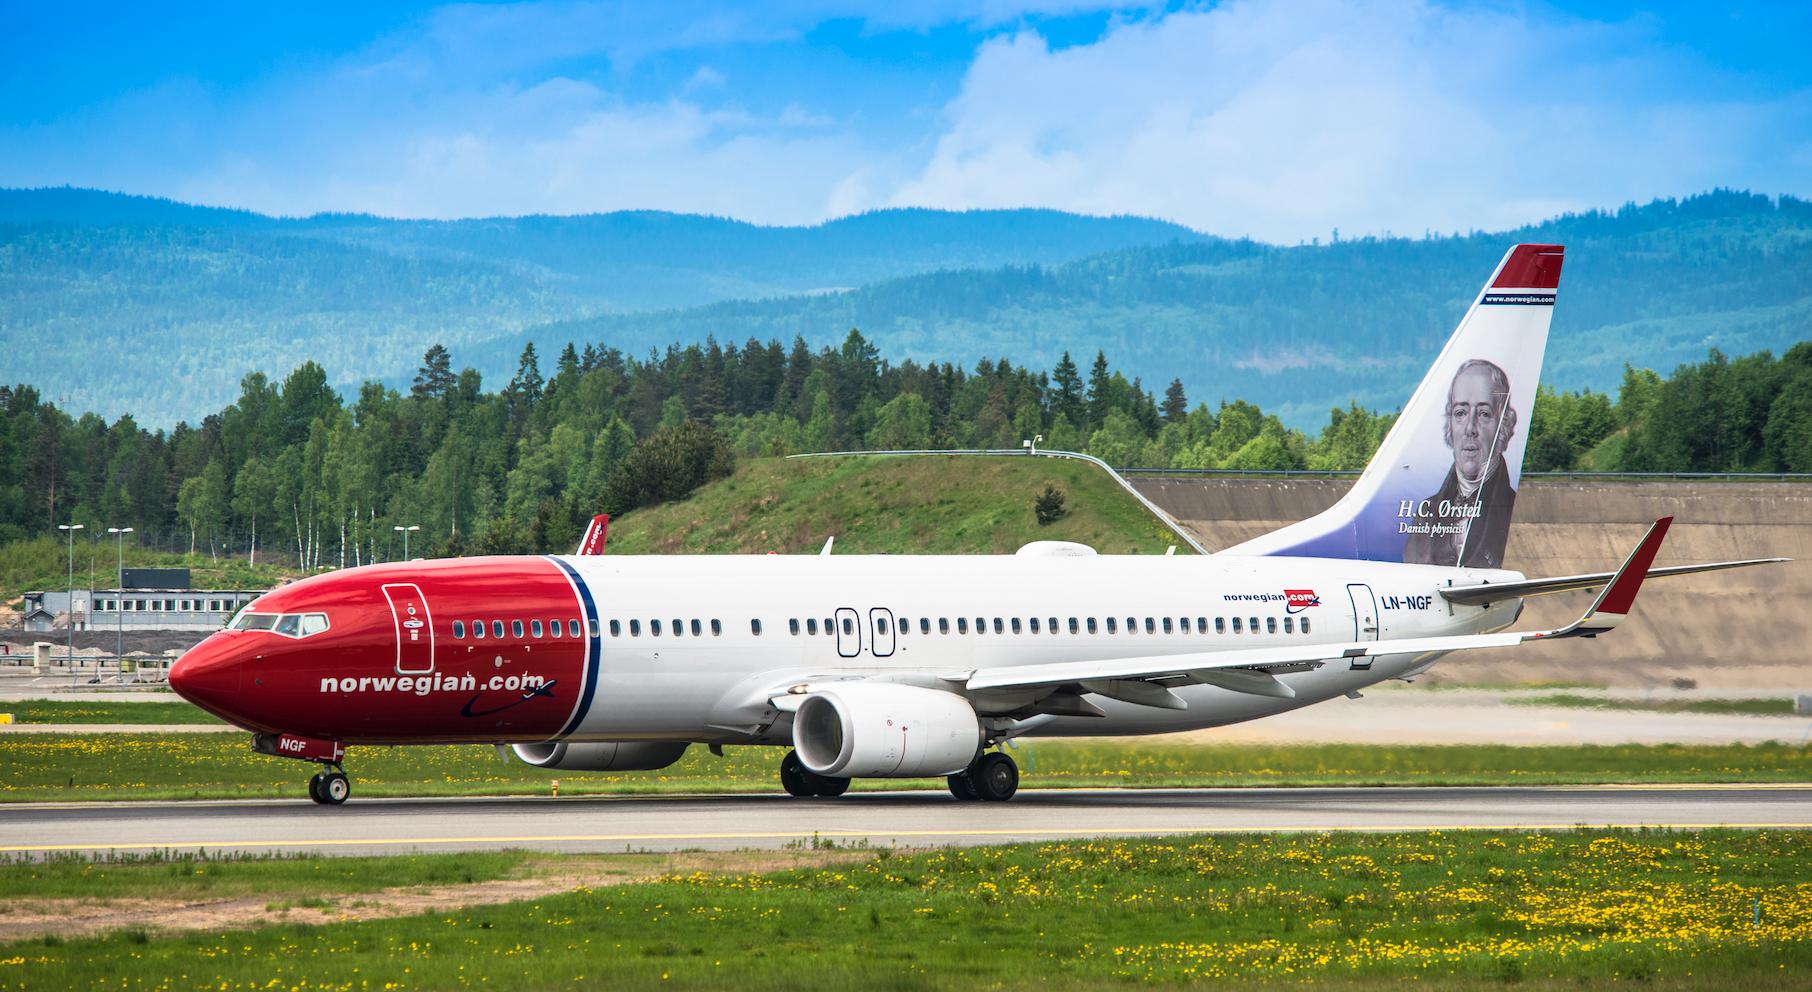 Photo: Courtesy of Norwegian media